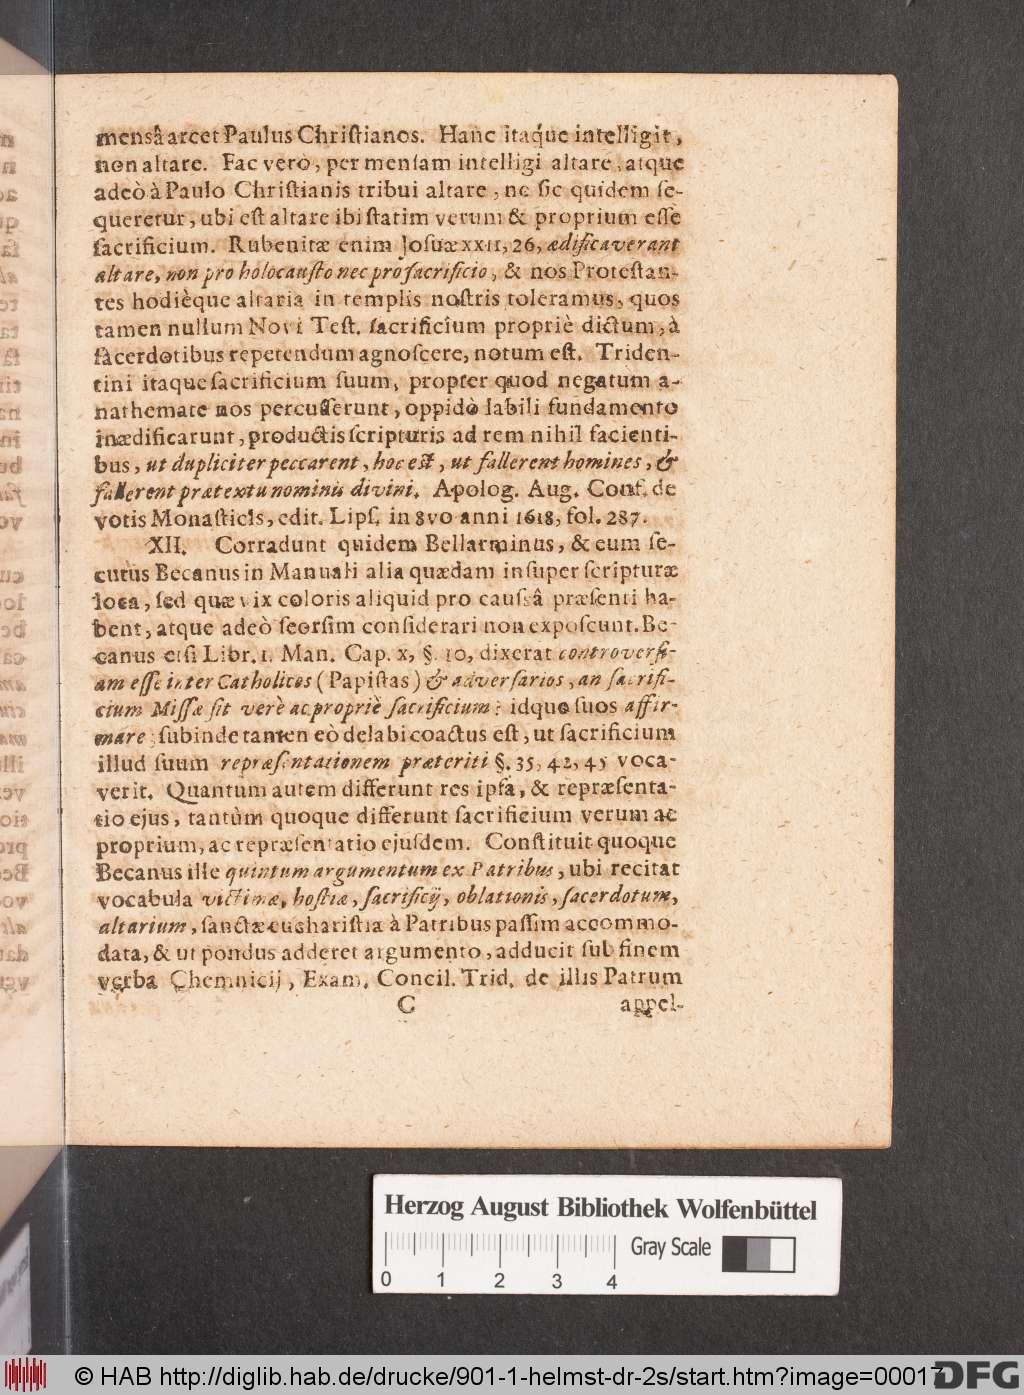 http://diglib.hab.de/drucke/901-1-helmst-dr-2s/00017.jpg